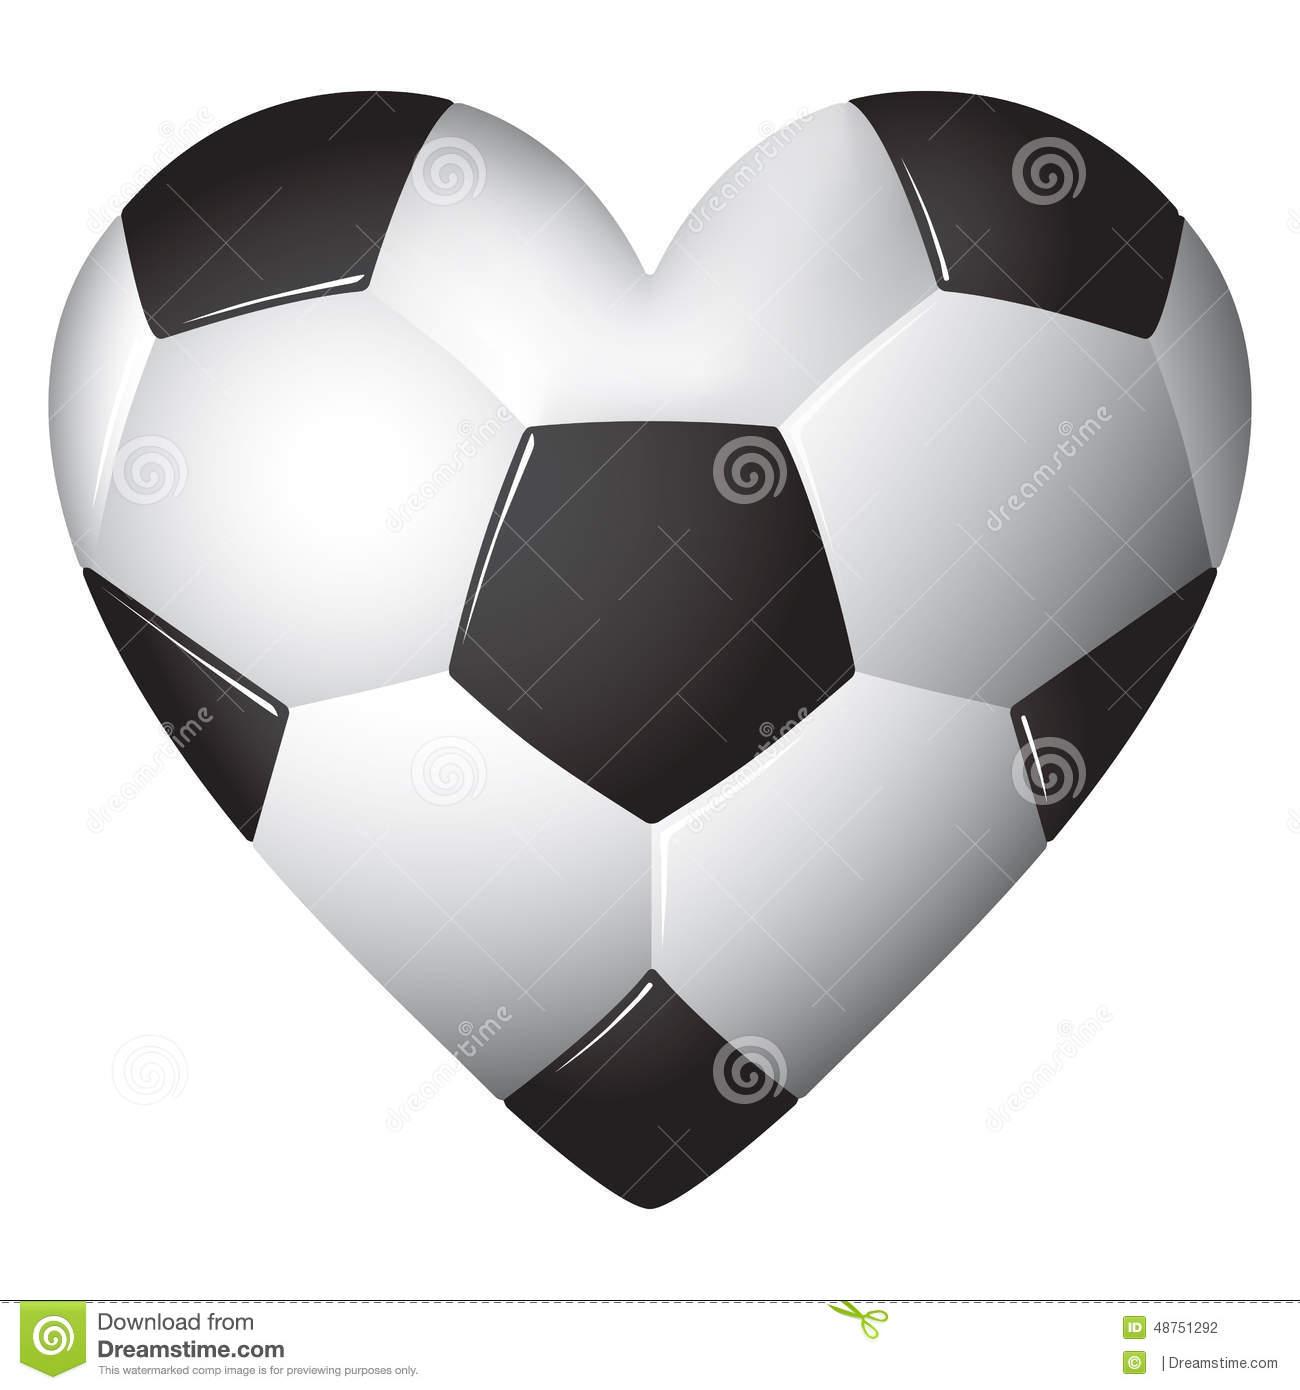 Soccer ball heart clipart banner free library Soccer Ball Football Heart Stock Illustrations – 441 Soccer Ball ... banner free library